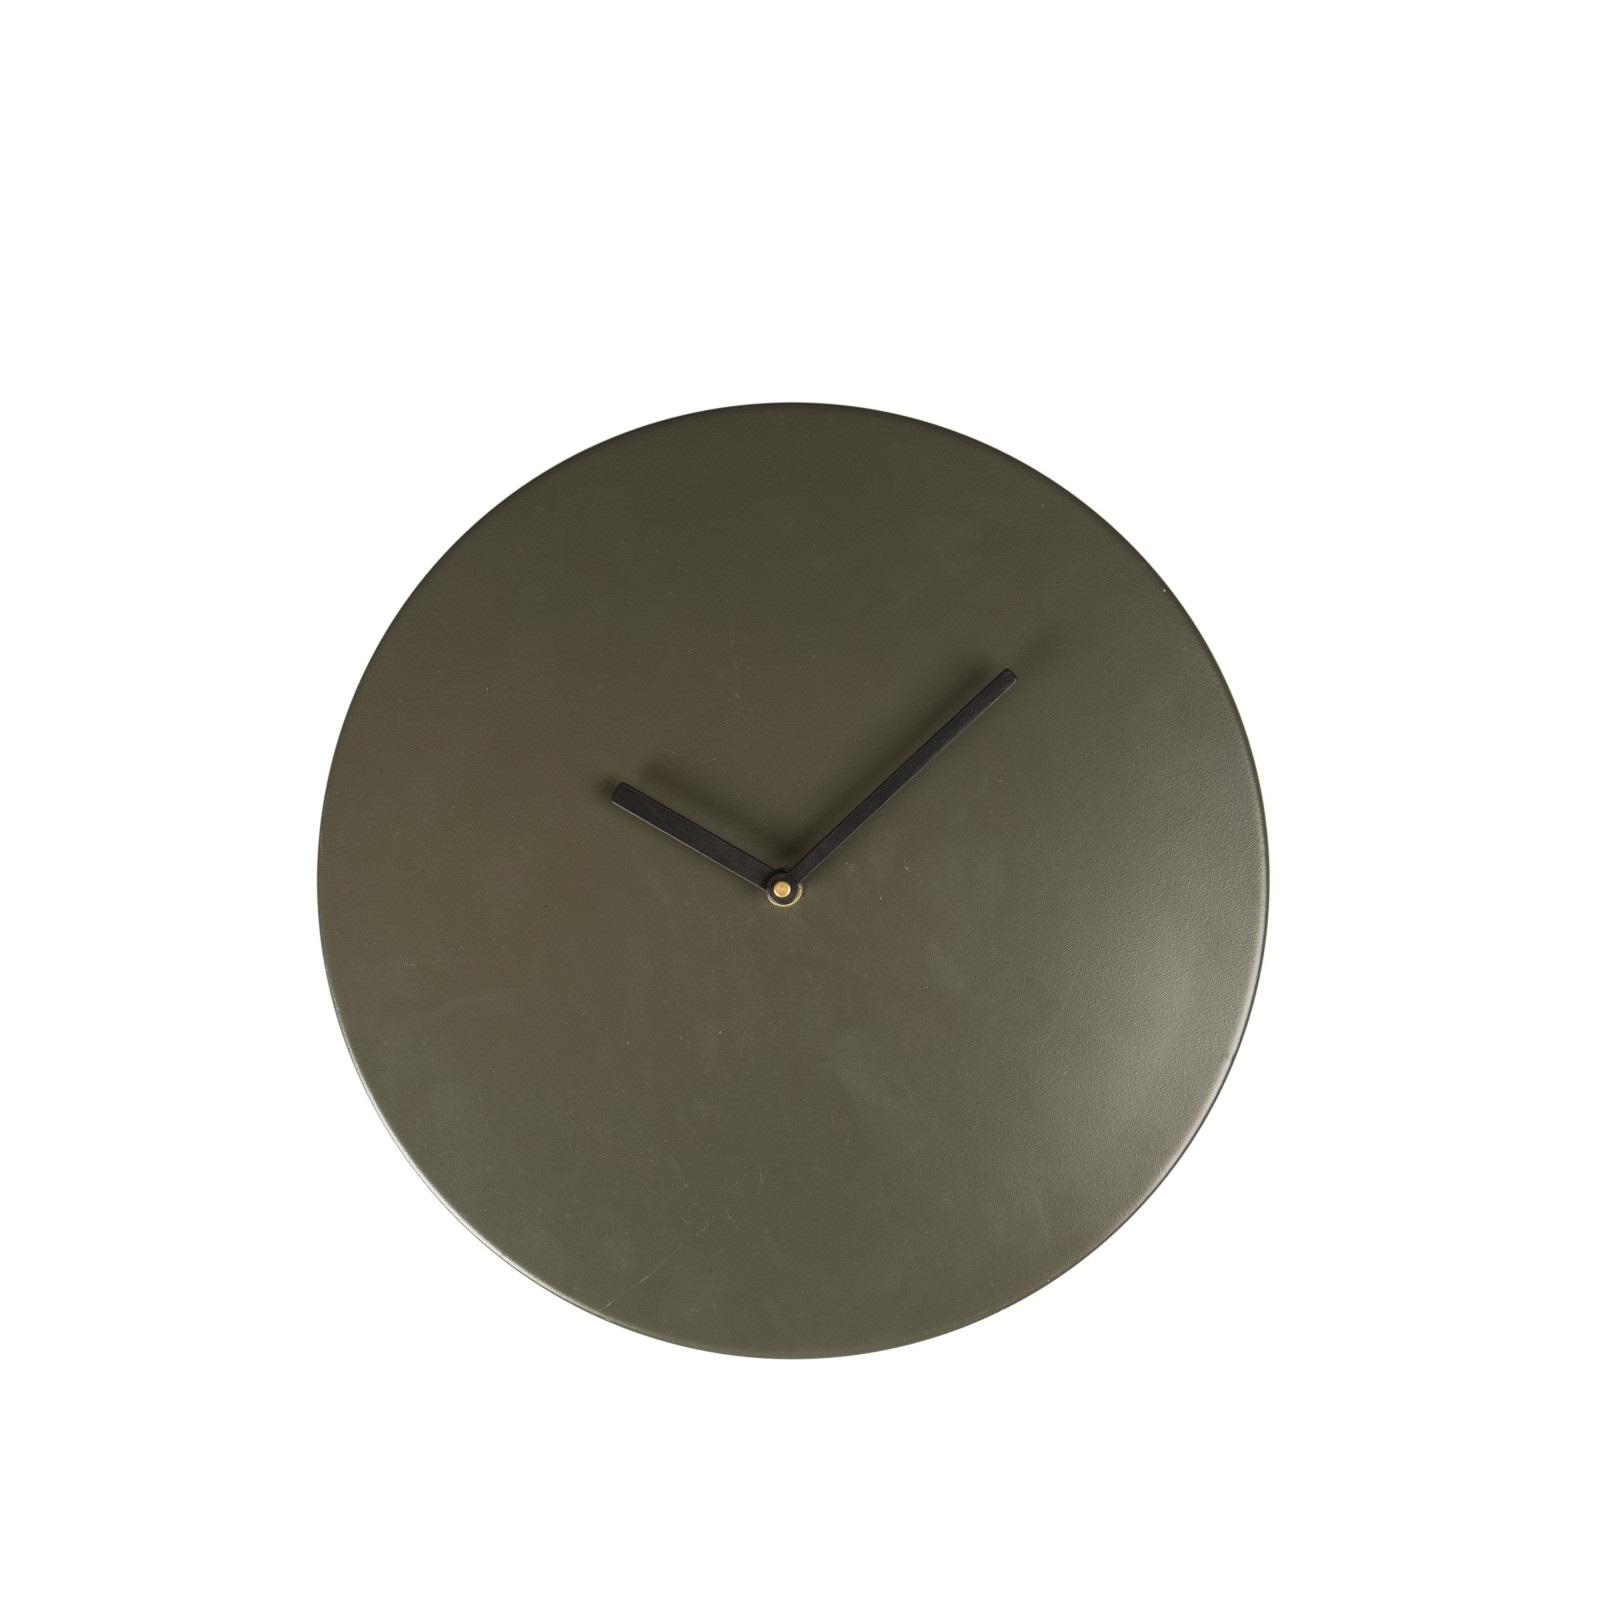 Klocka CLOCK SHAHID grön, ByON thumbnail